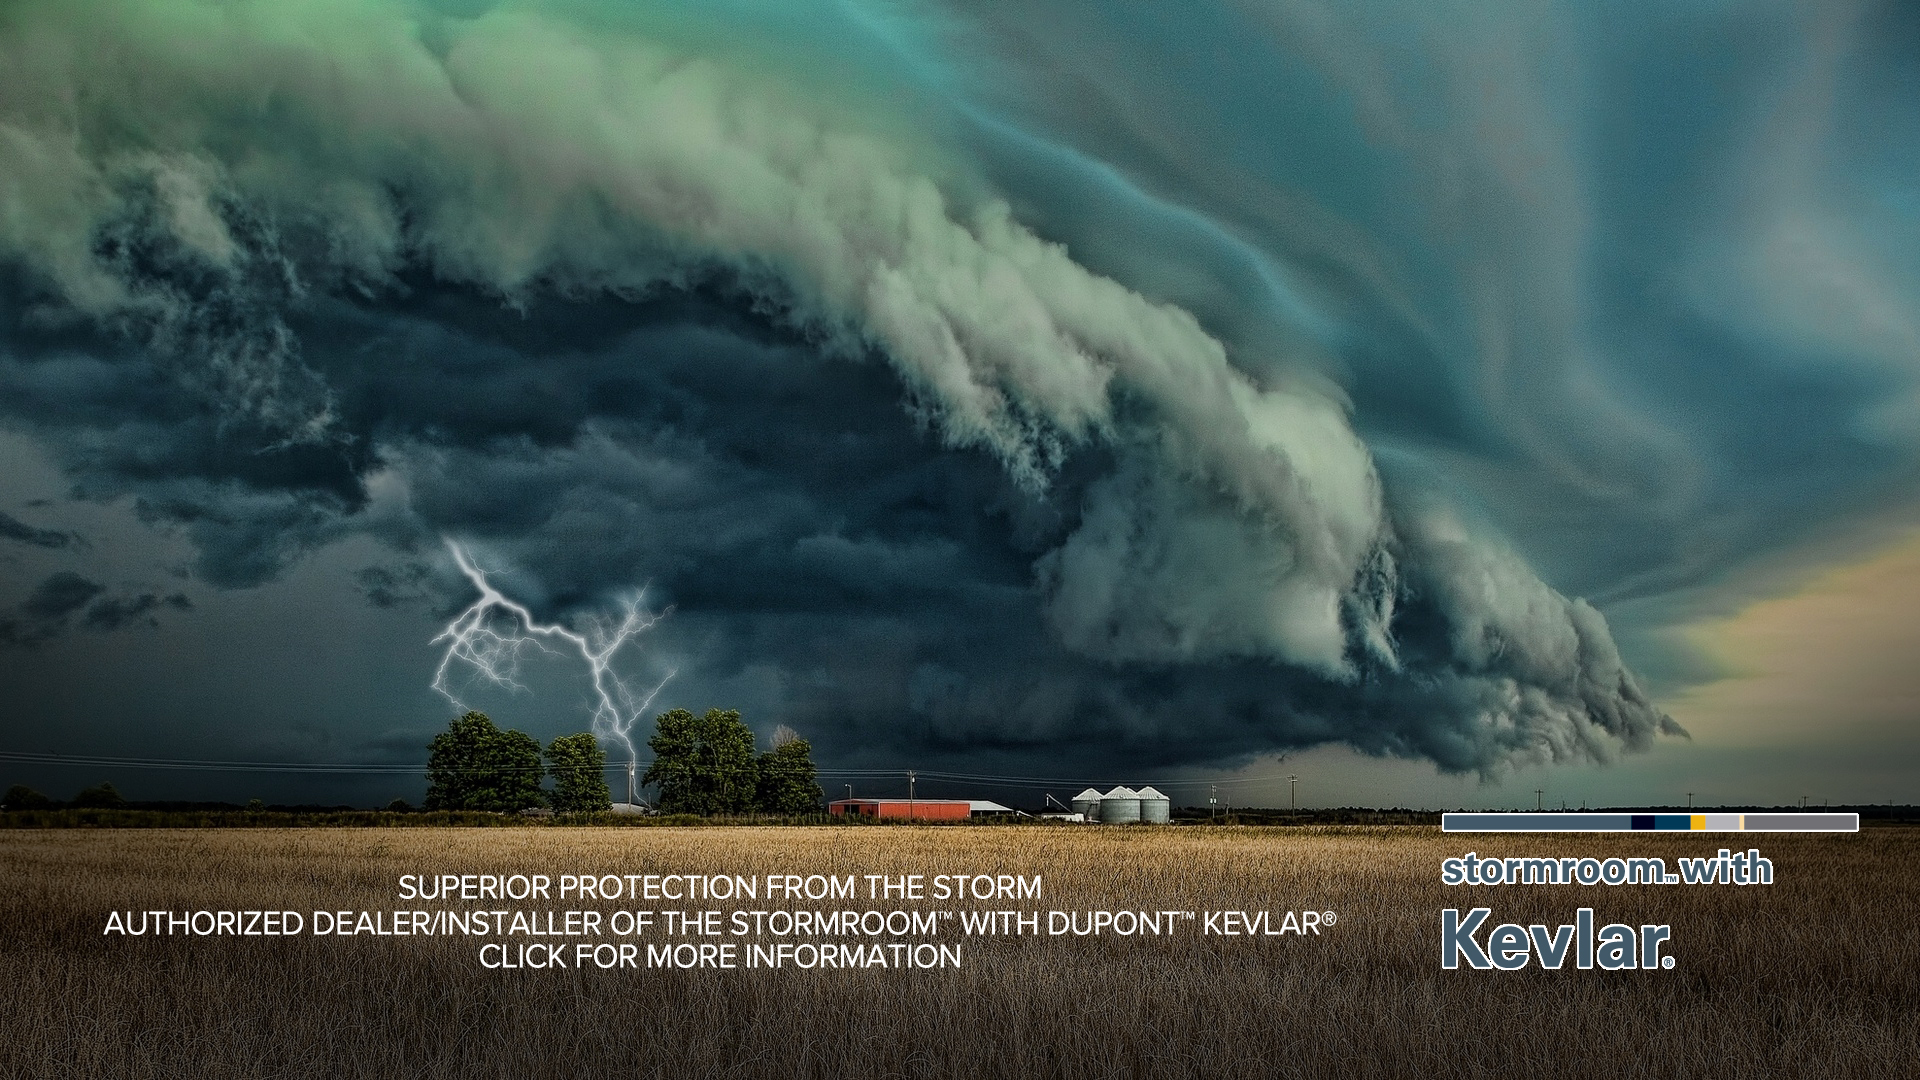 storm room